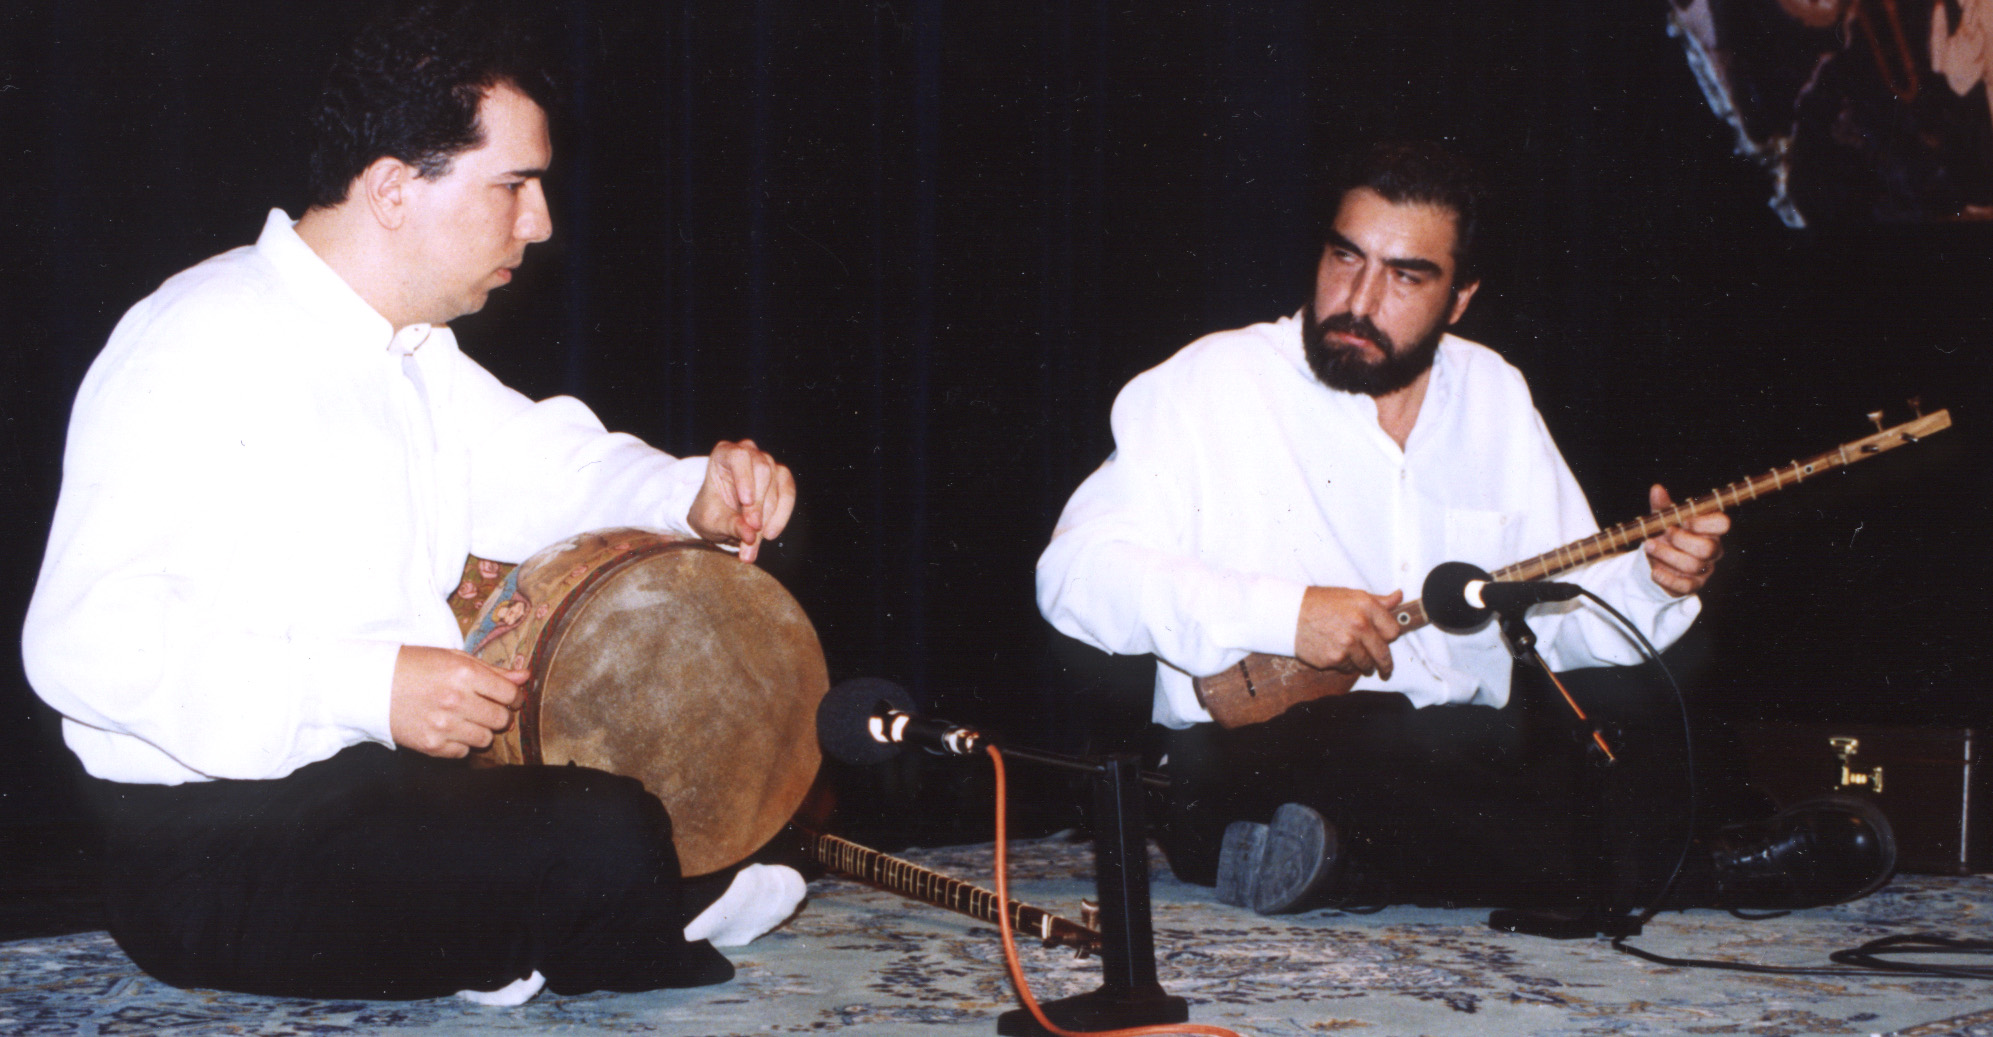 peyman-nasehpour-tonbak-massoud-shoari-setar-persian